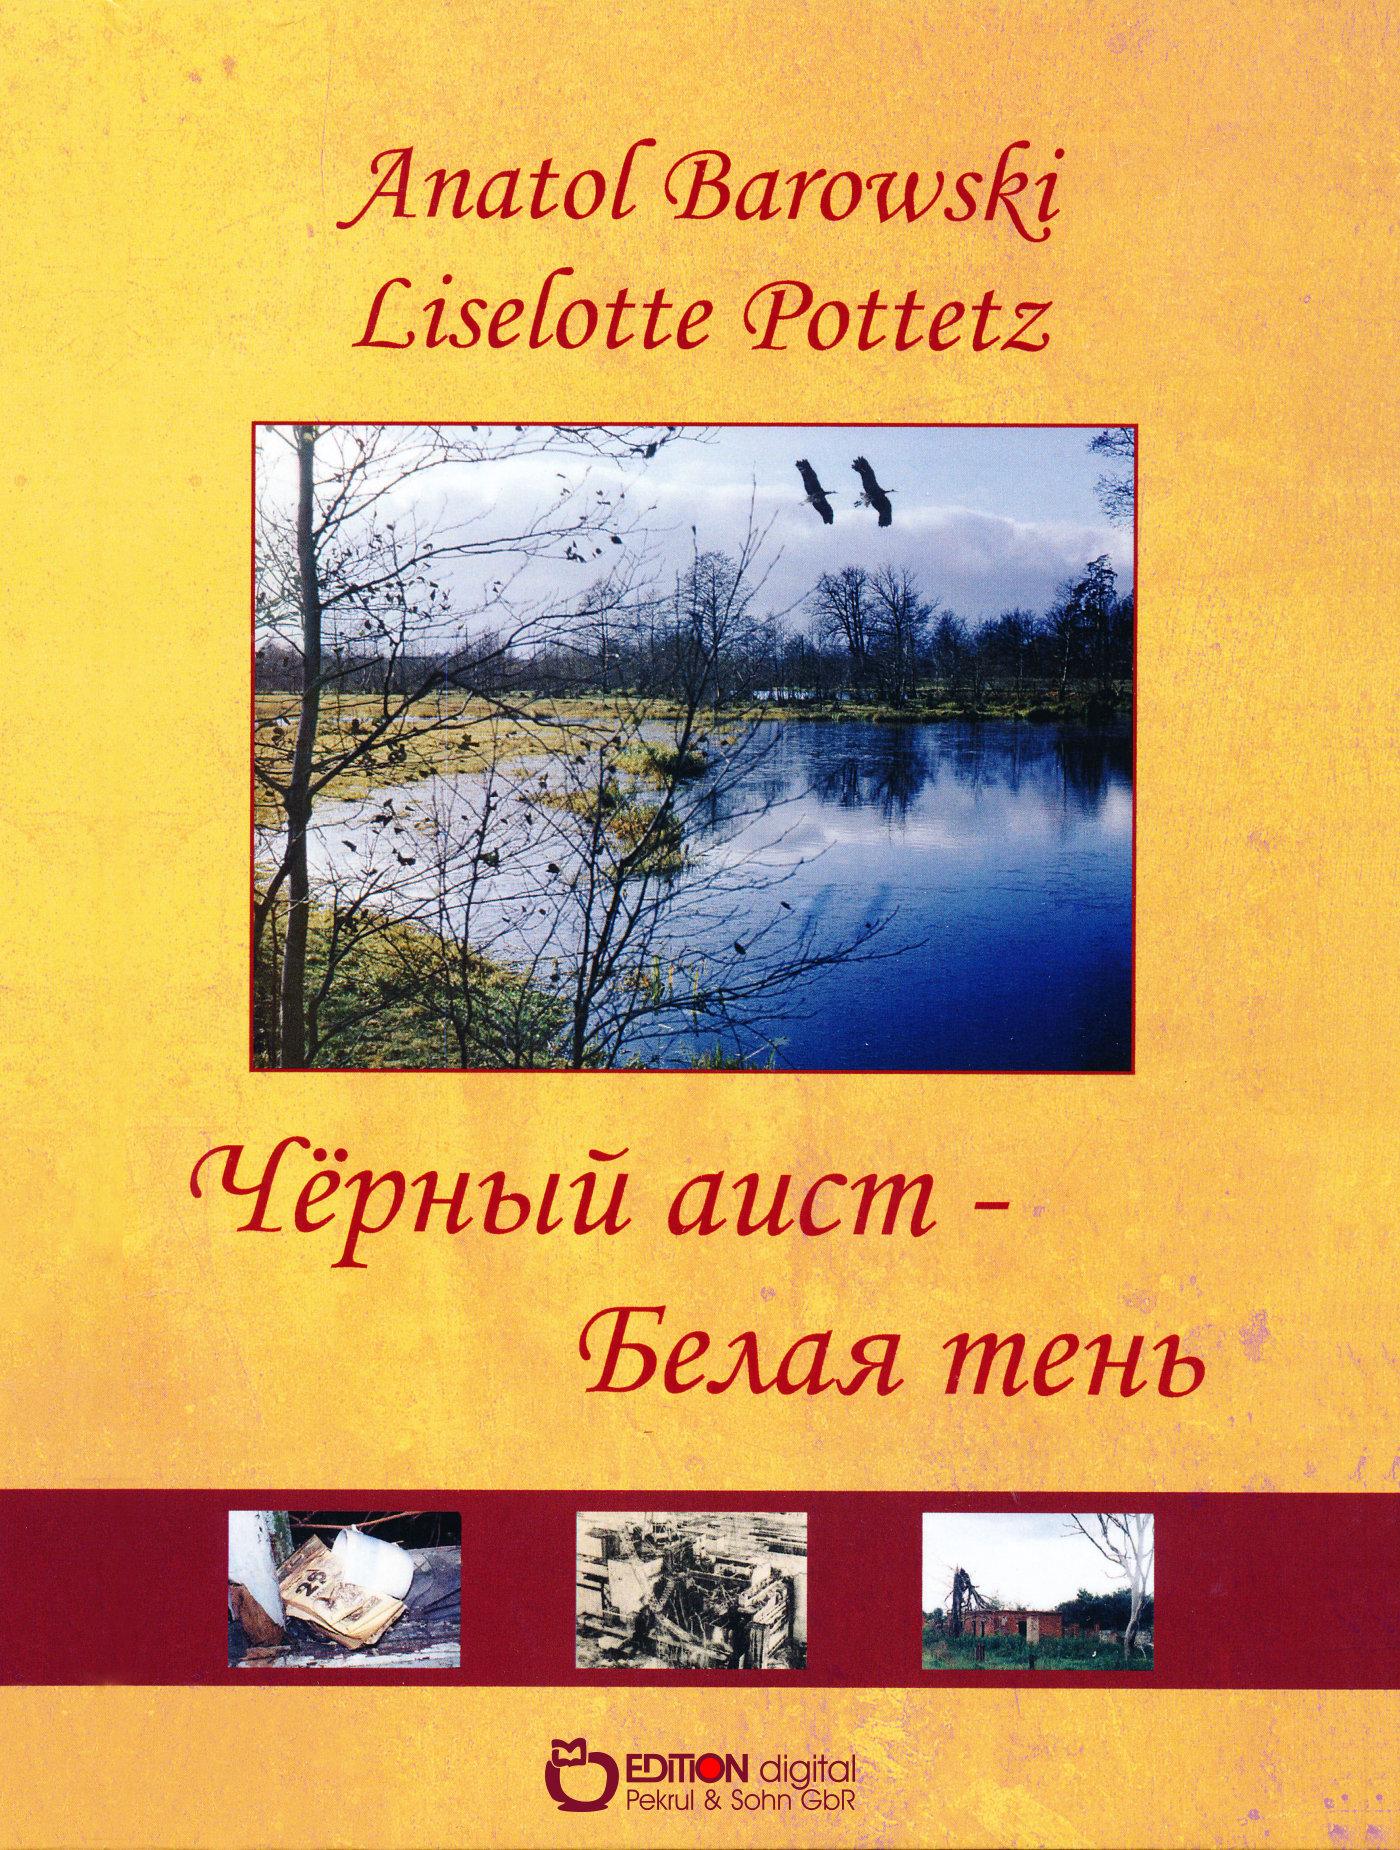 Чёрный аист von Liselotte Pottetz, Anatol Barowski